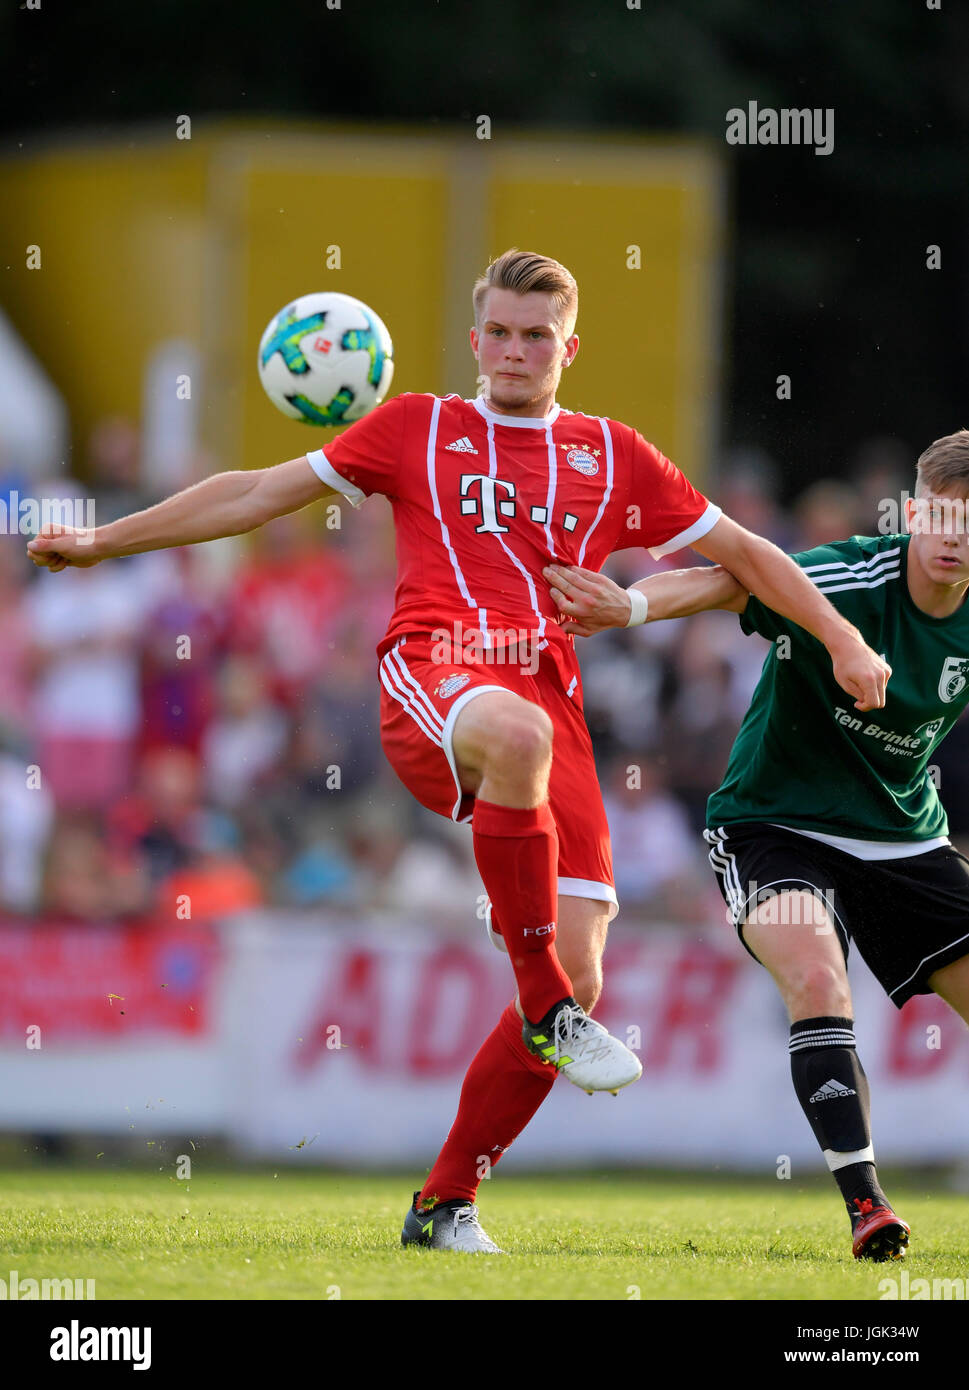 06.07.2017, Fussball 1.Bundesliga 2017/2018, Saisonvorbereitung, BCF Wolfratshausen - FC Bayern München, im - Stock Image